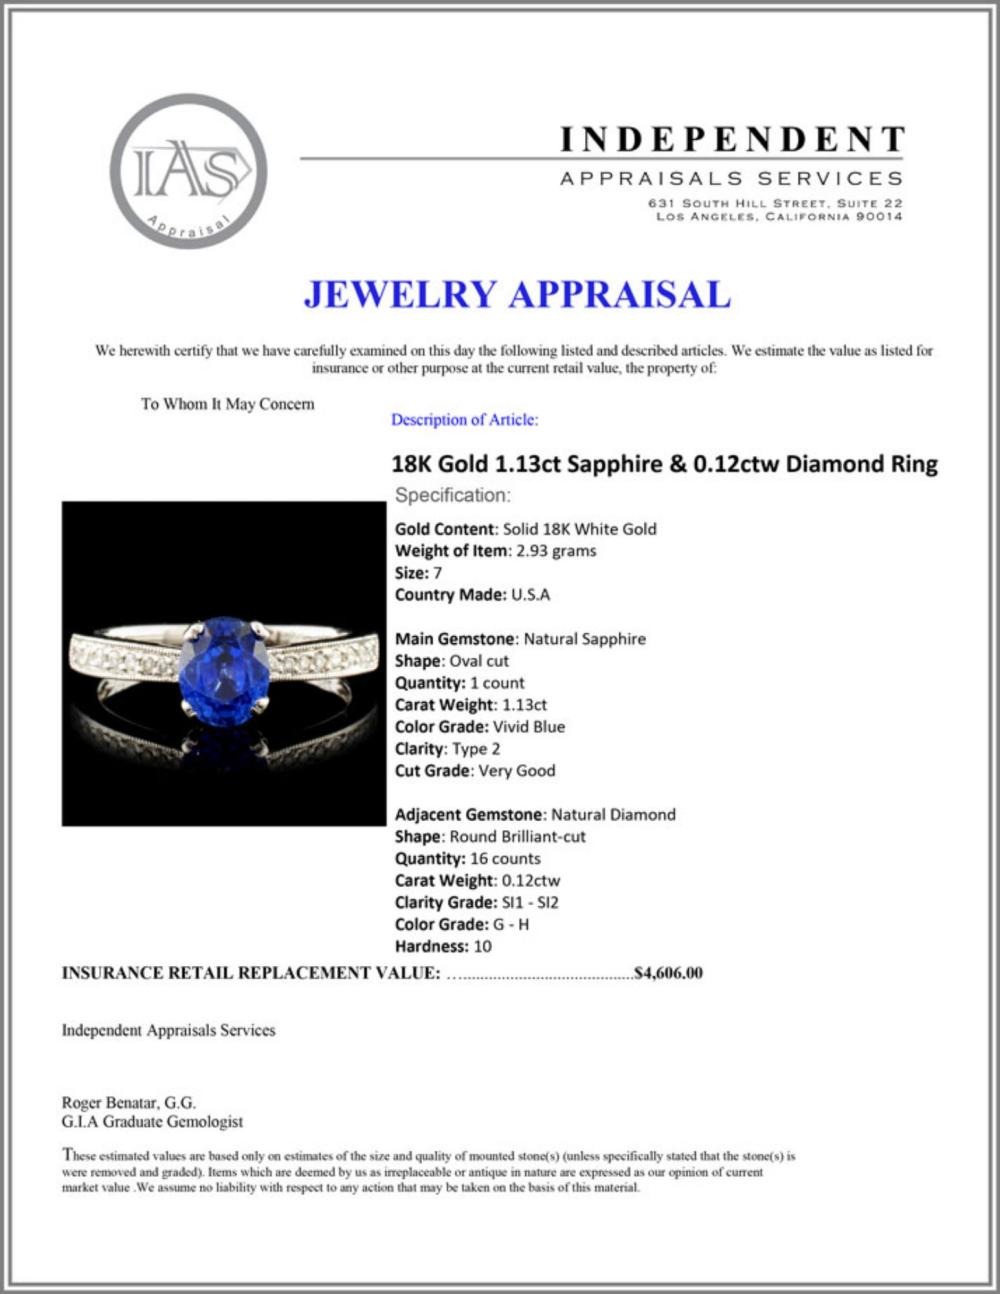 Lot 113: 18K Gold 1.13ct Sapphire & 0.12ctw Diamond Ring